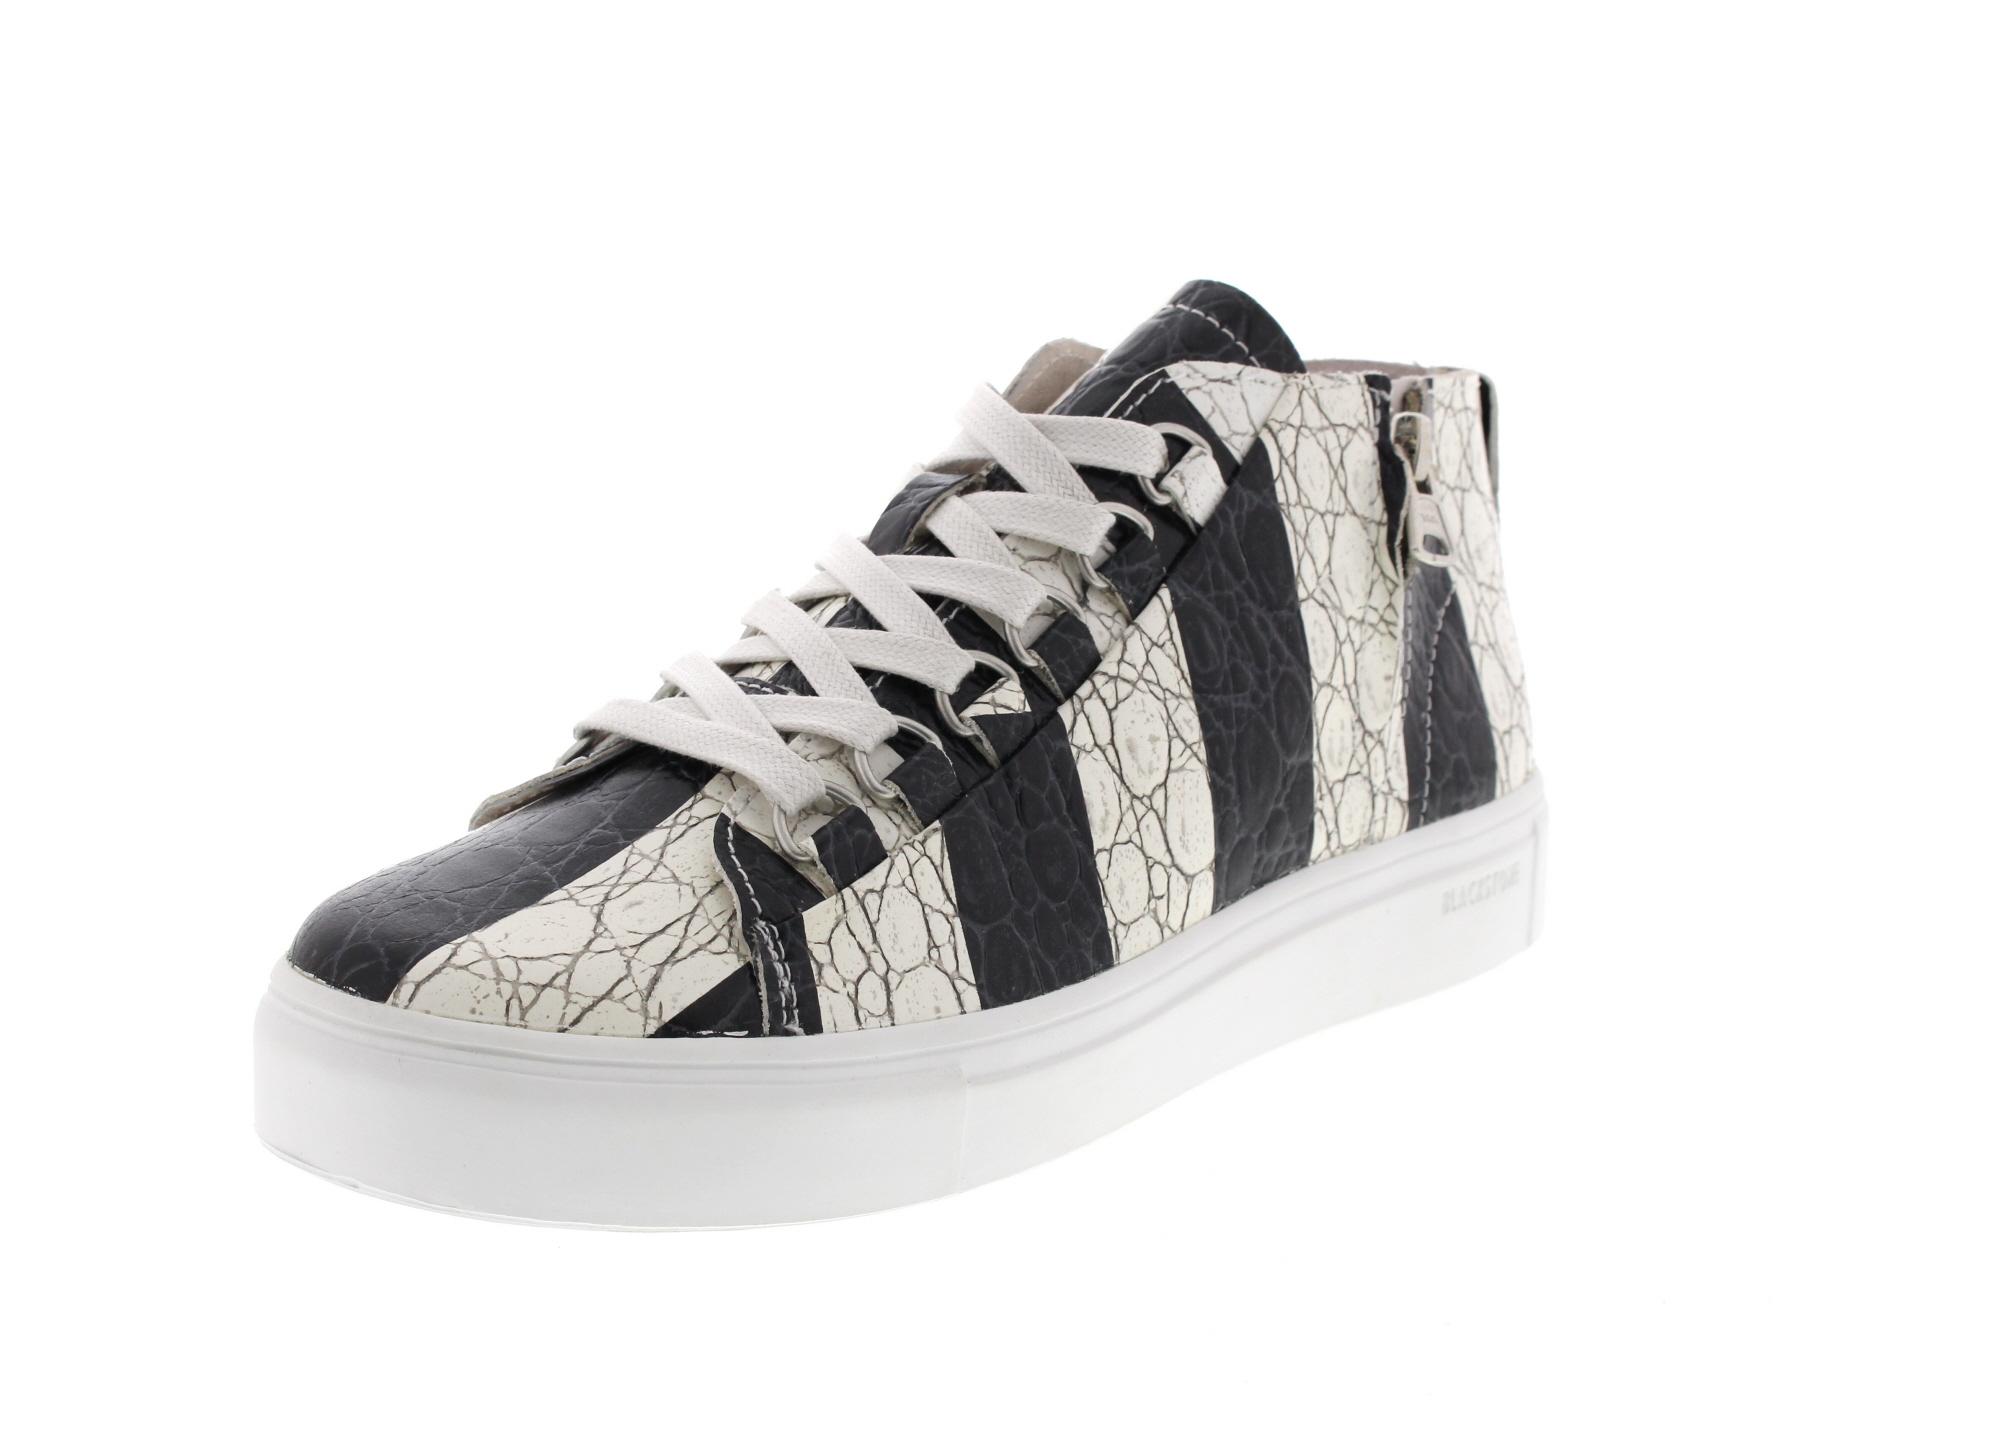 BLACKSTONE Damenschuhe - Sneaker NL43 - stripes black0